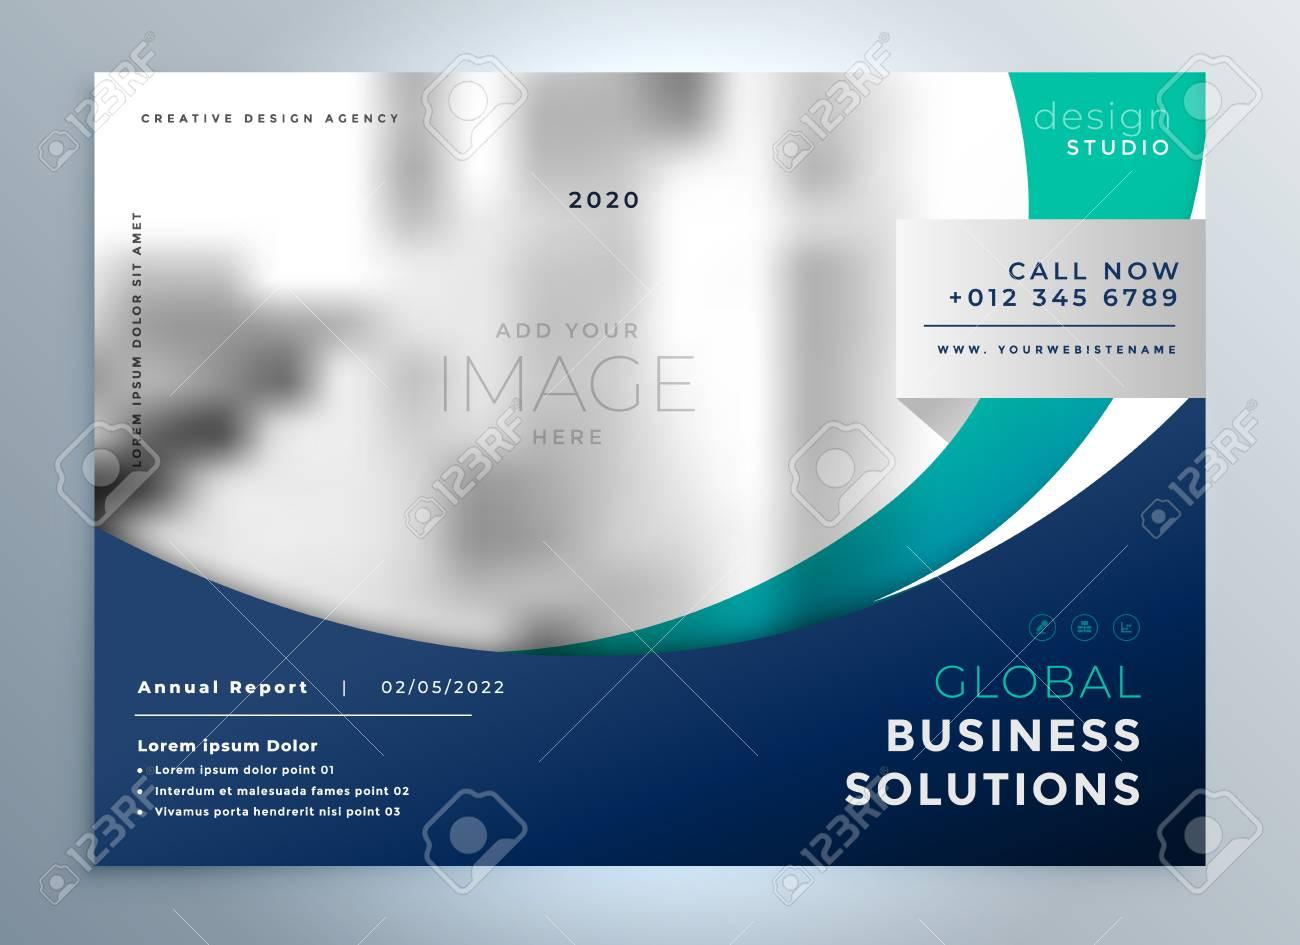 Business brochure modern presentation background - 100874864